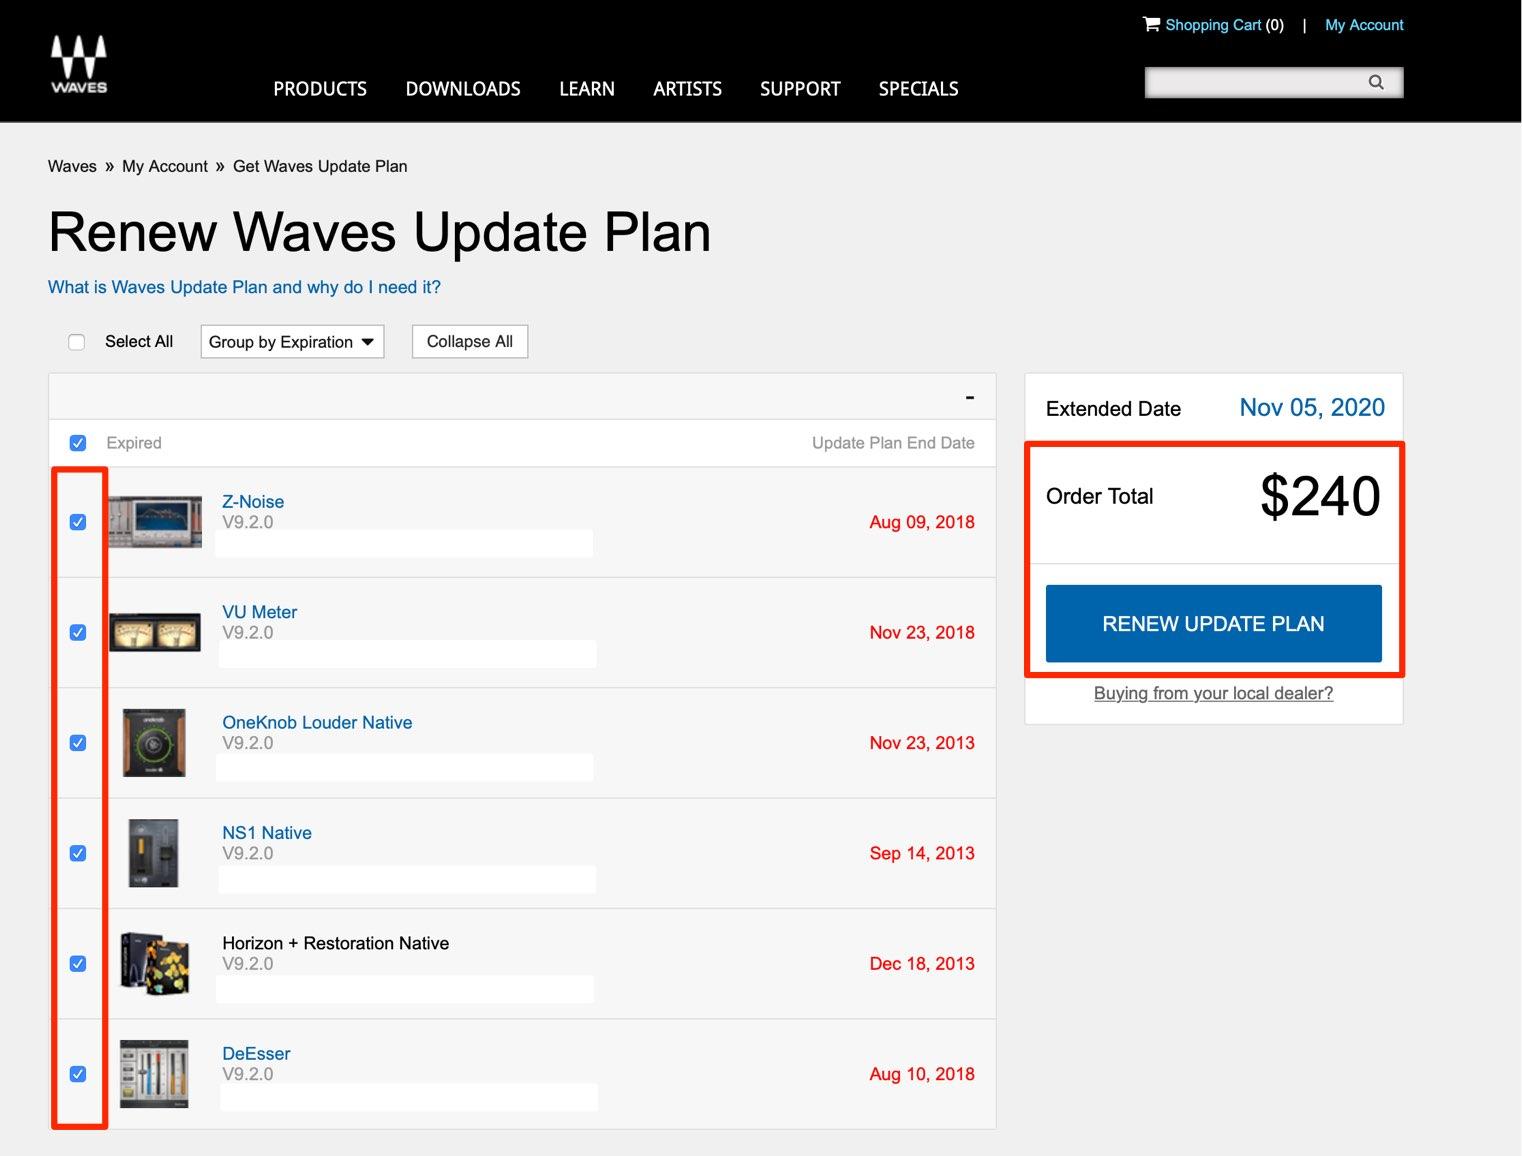 Get Waves Update Plan